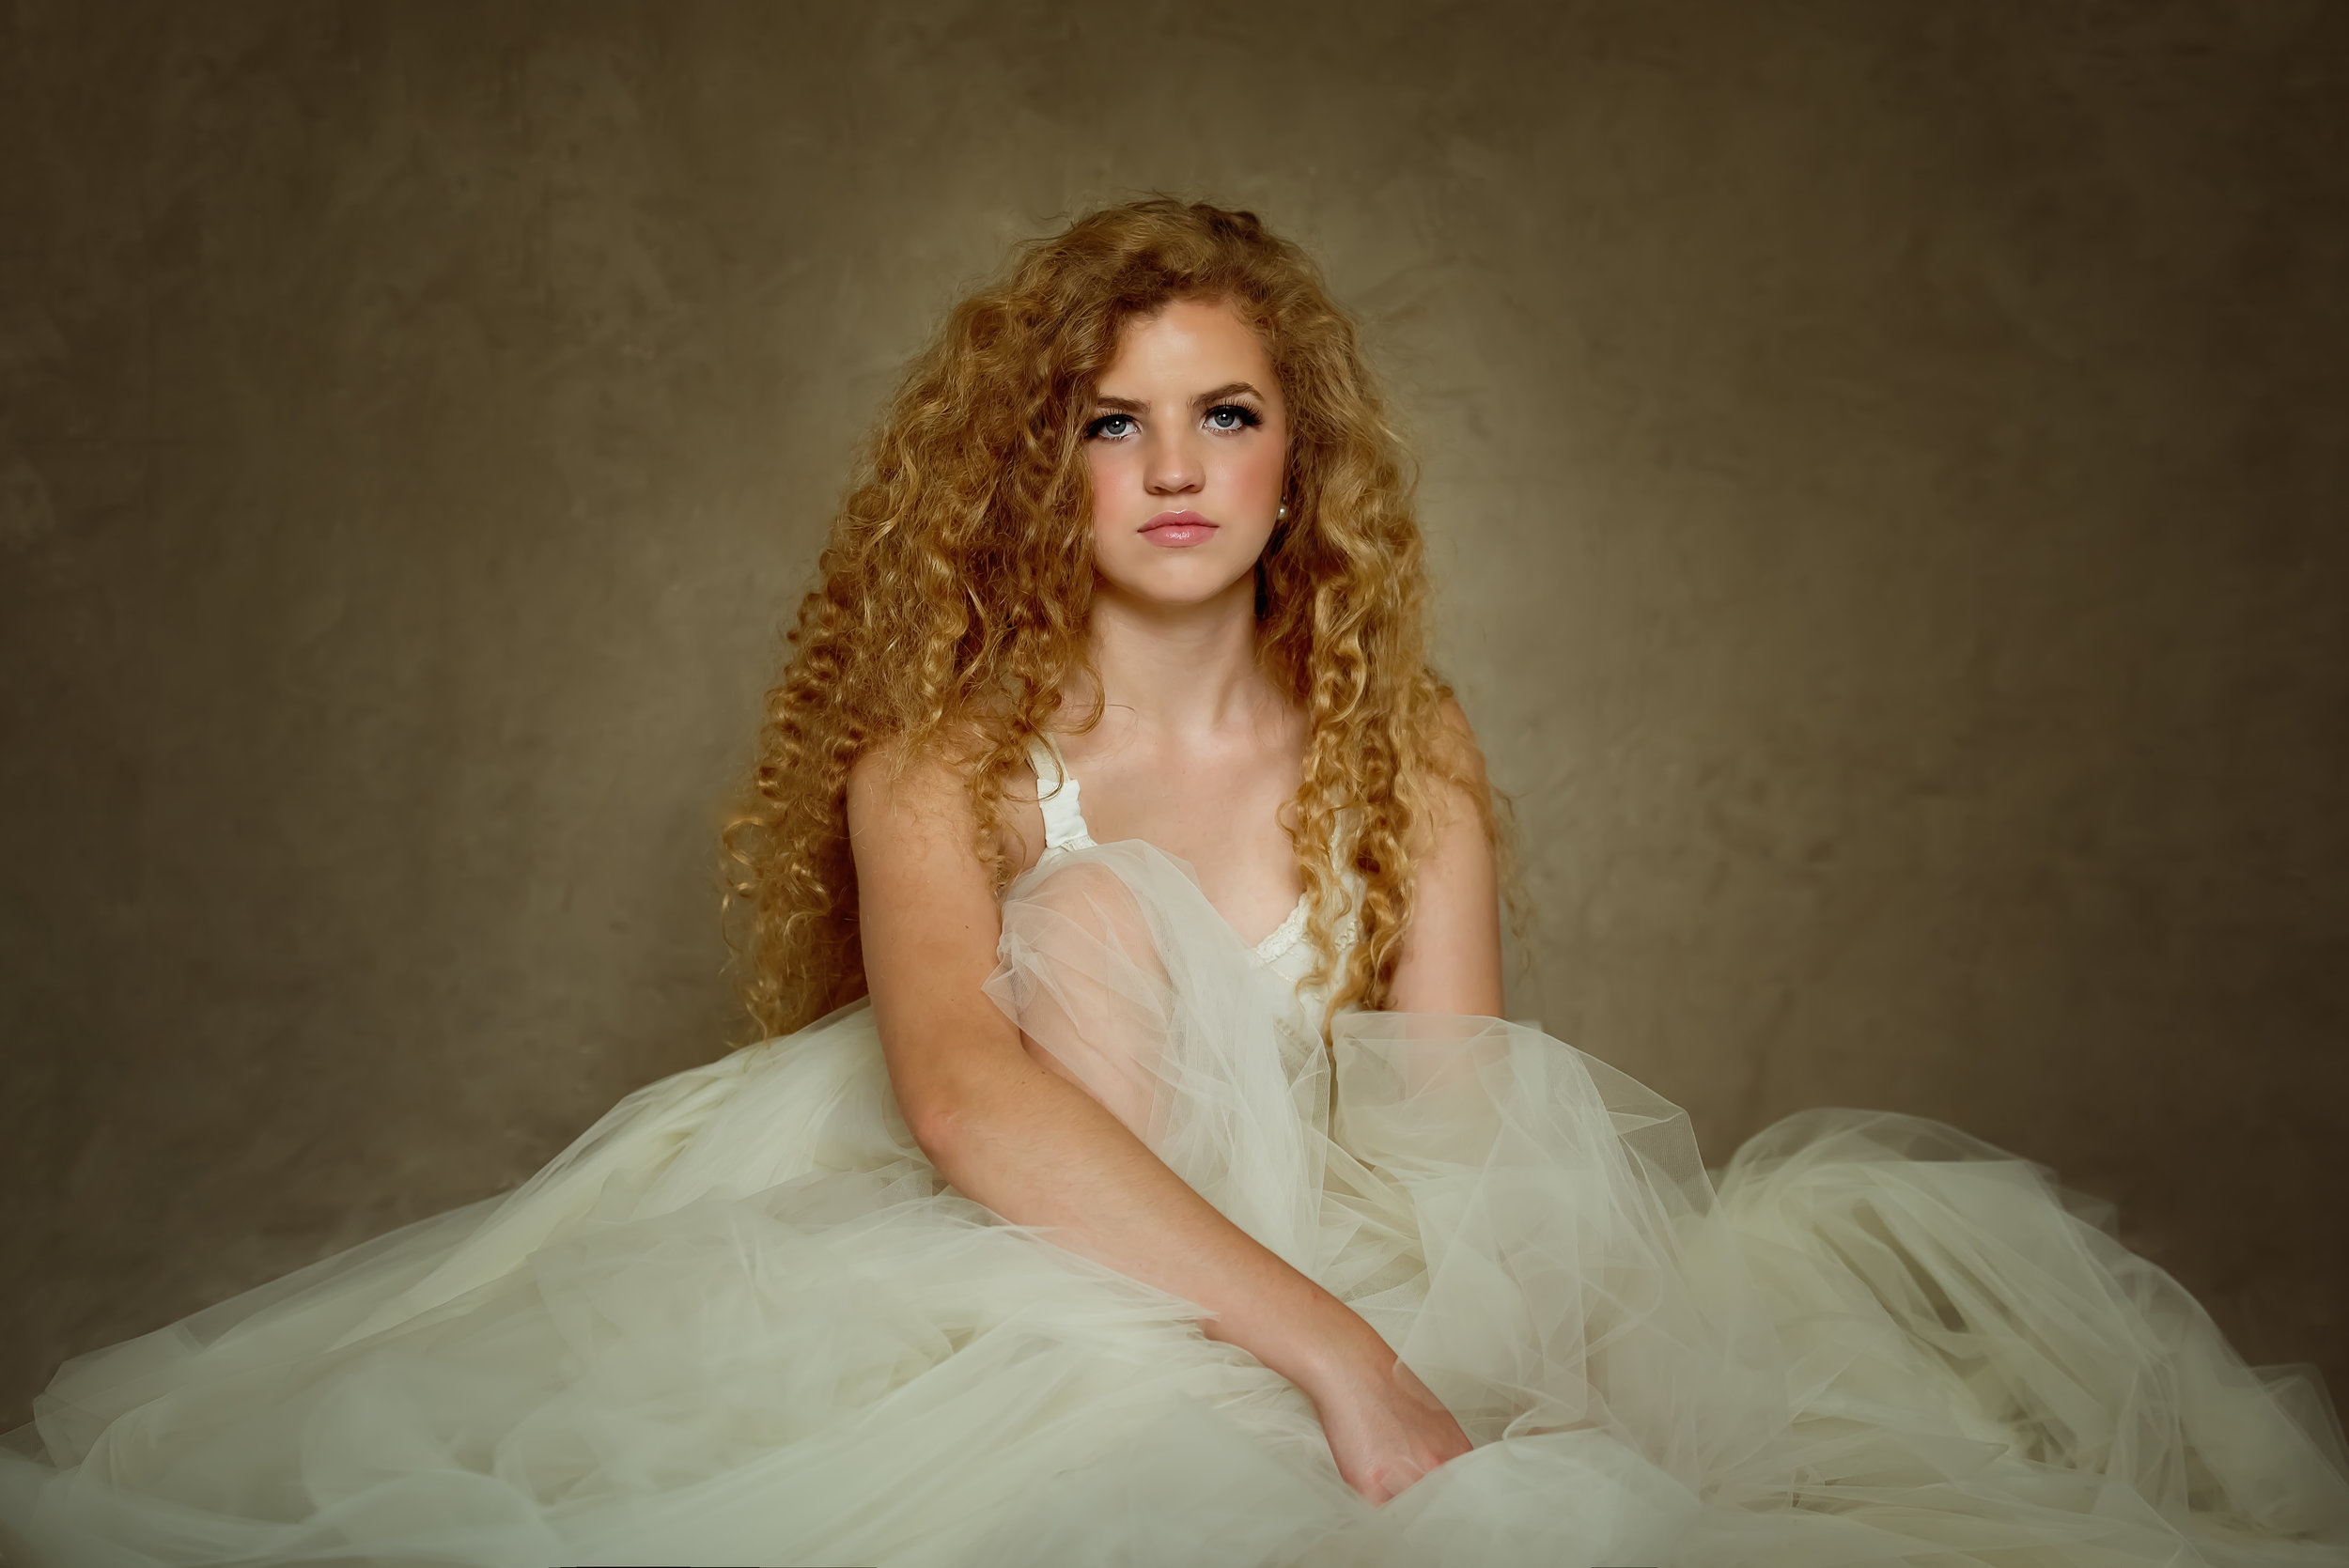 Reina-LeGrand-Photography-Photographer-Beauty-Womens-DFW-Dallas-Fort-Worth-Denton-Southlake-Colleyville-Grapevine-Roanoke-Keller-Westlake-Portrait-Portraiture-Photo-Session-Cherri.jpg